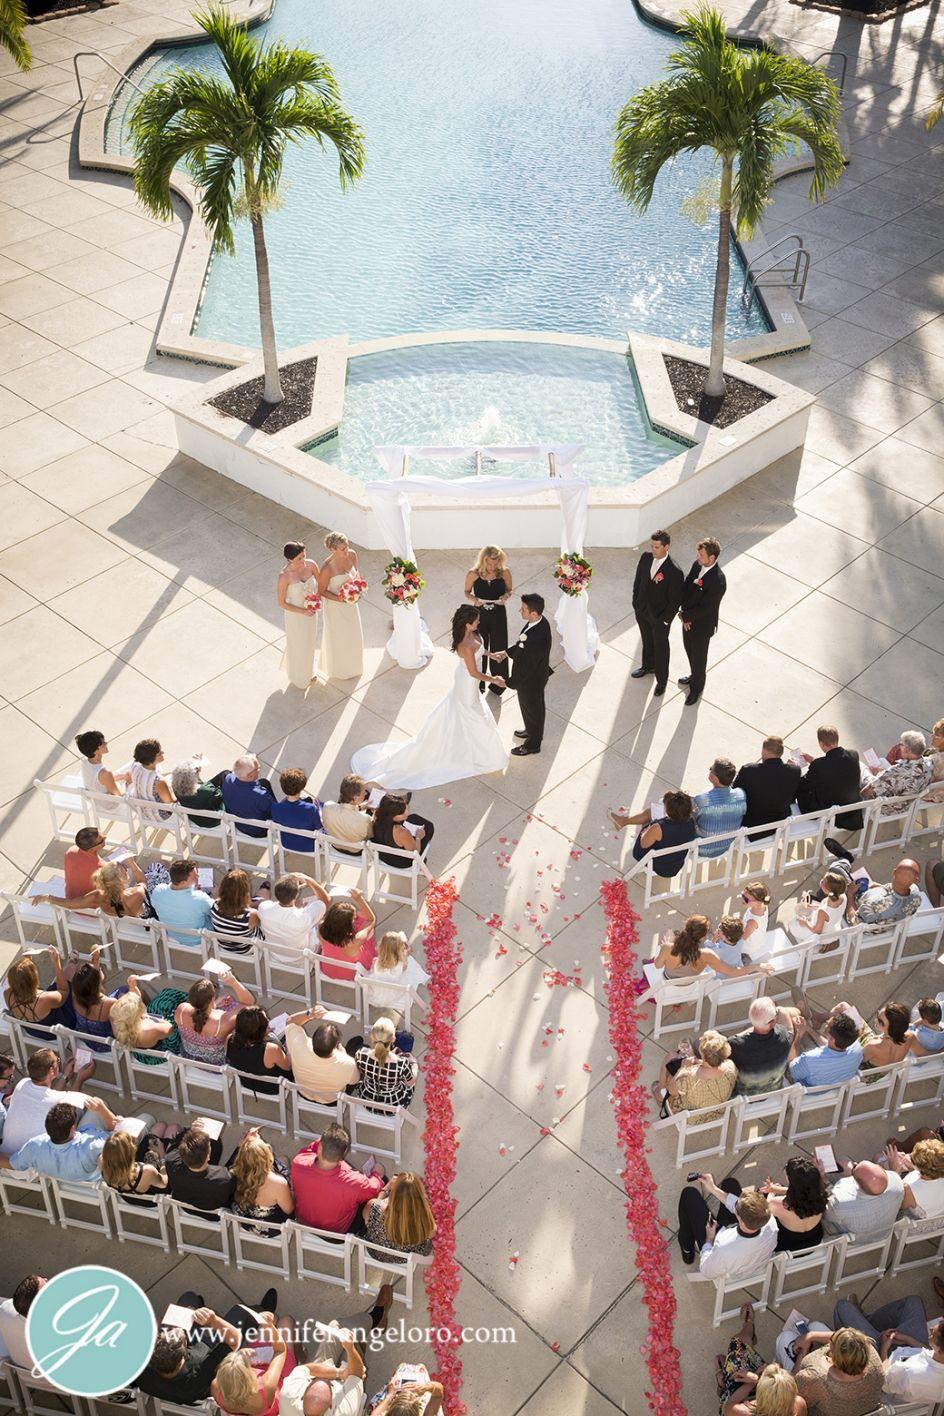 Beautiful Florida Destination Wedding At Sanibel Harbour Marriott Resort And Spa